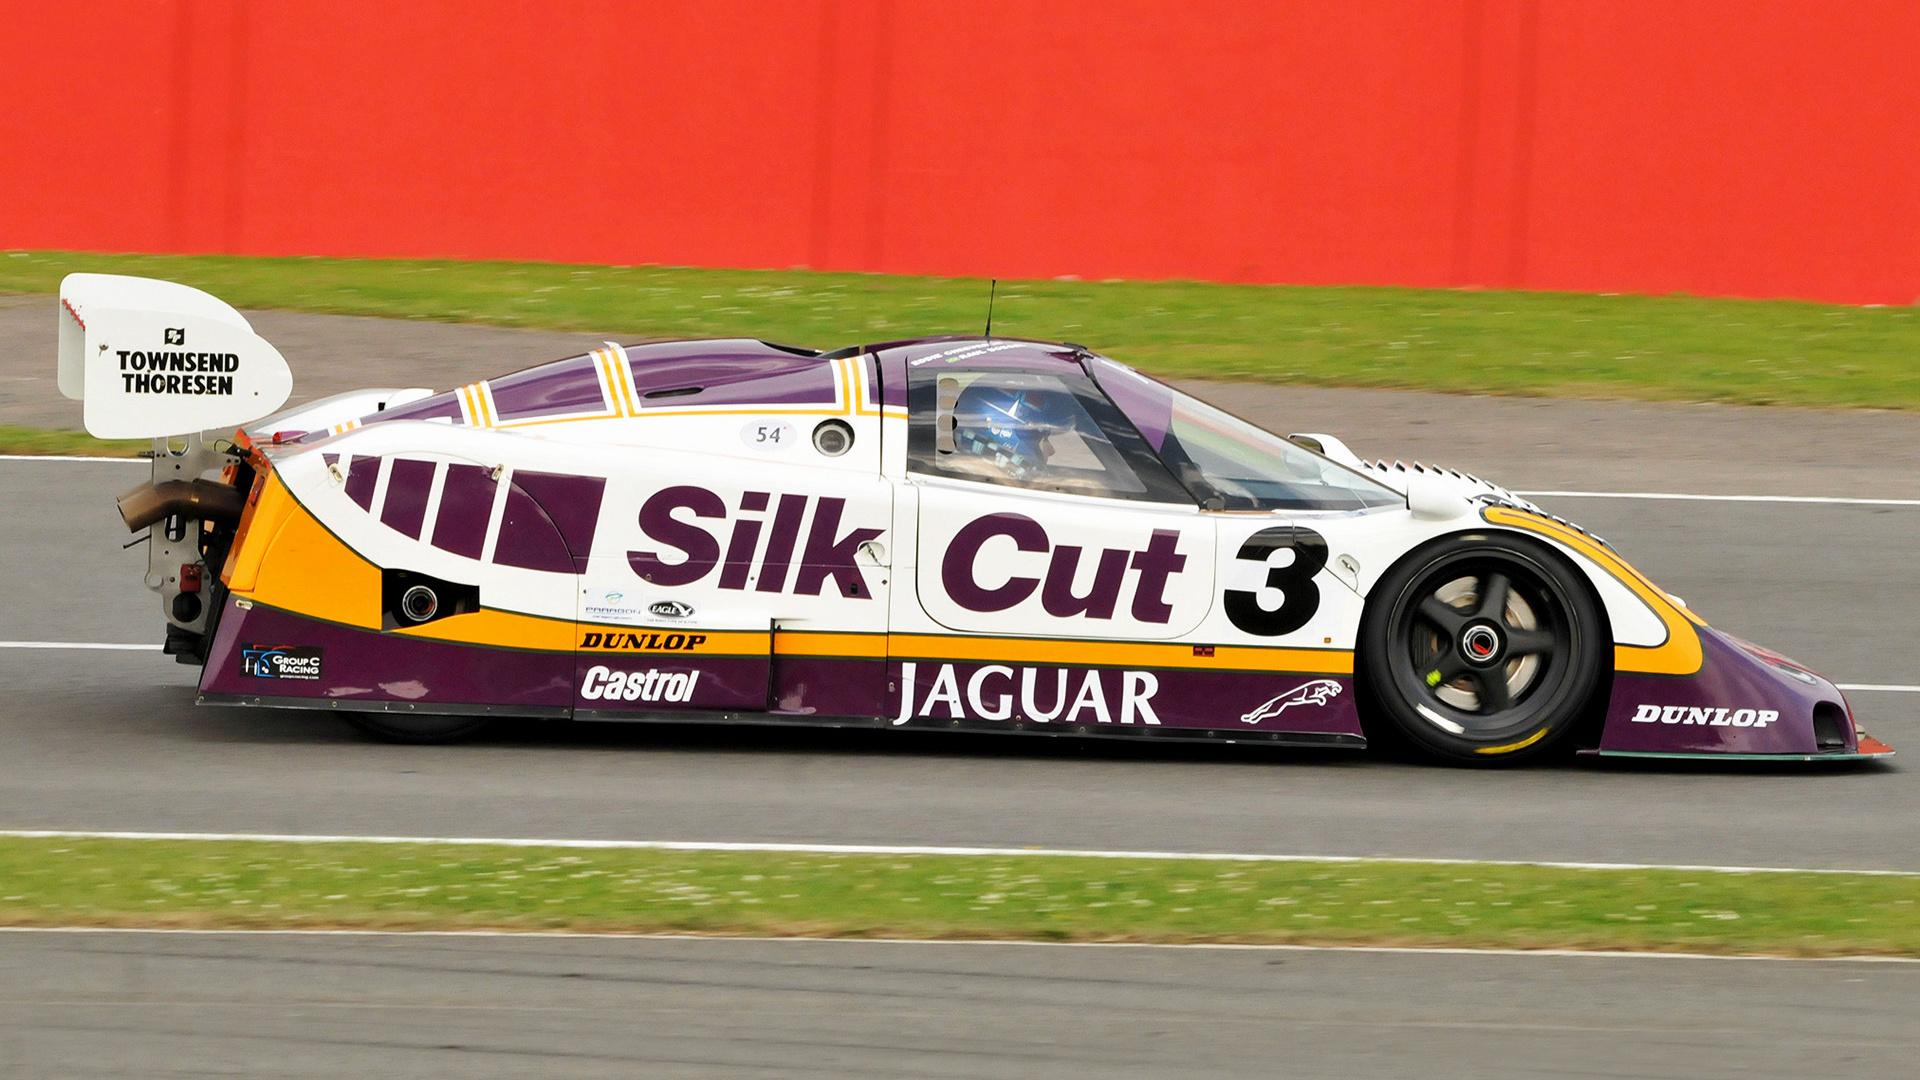 Jaguar XJR-8 (1987) Wallpapers and HD Images - Car Pixel